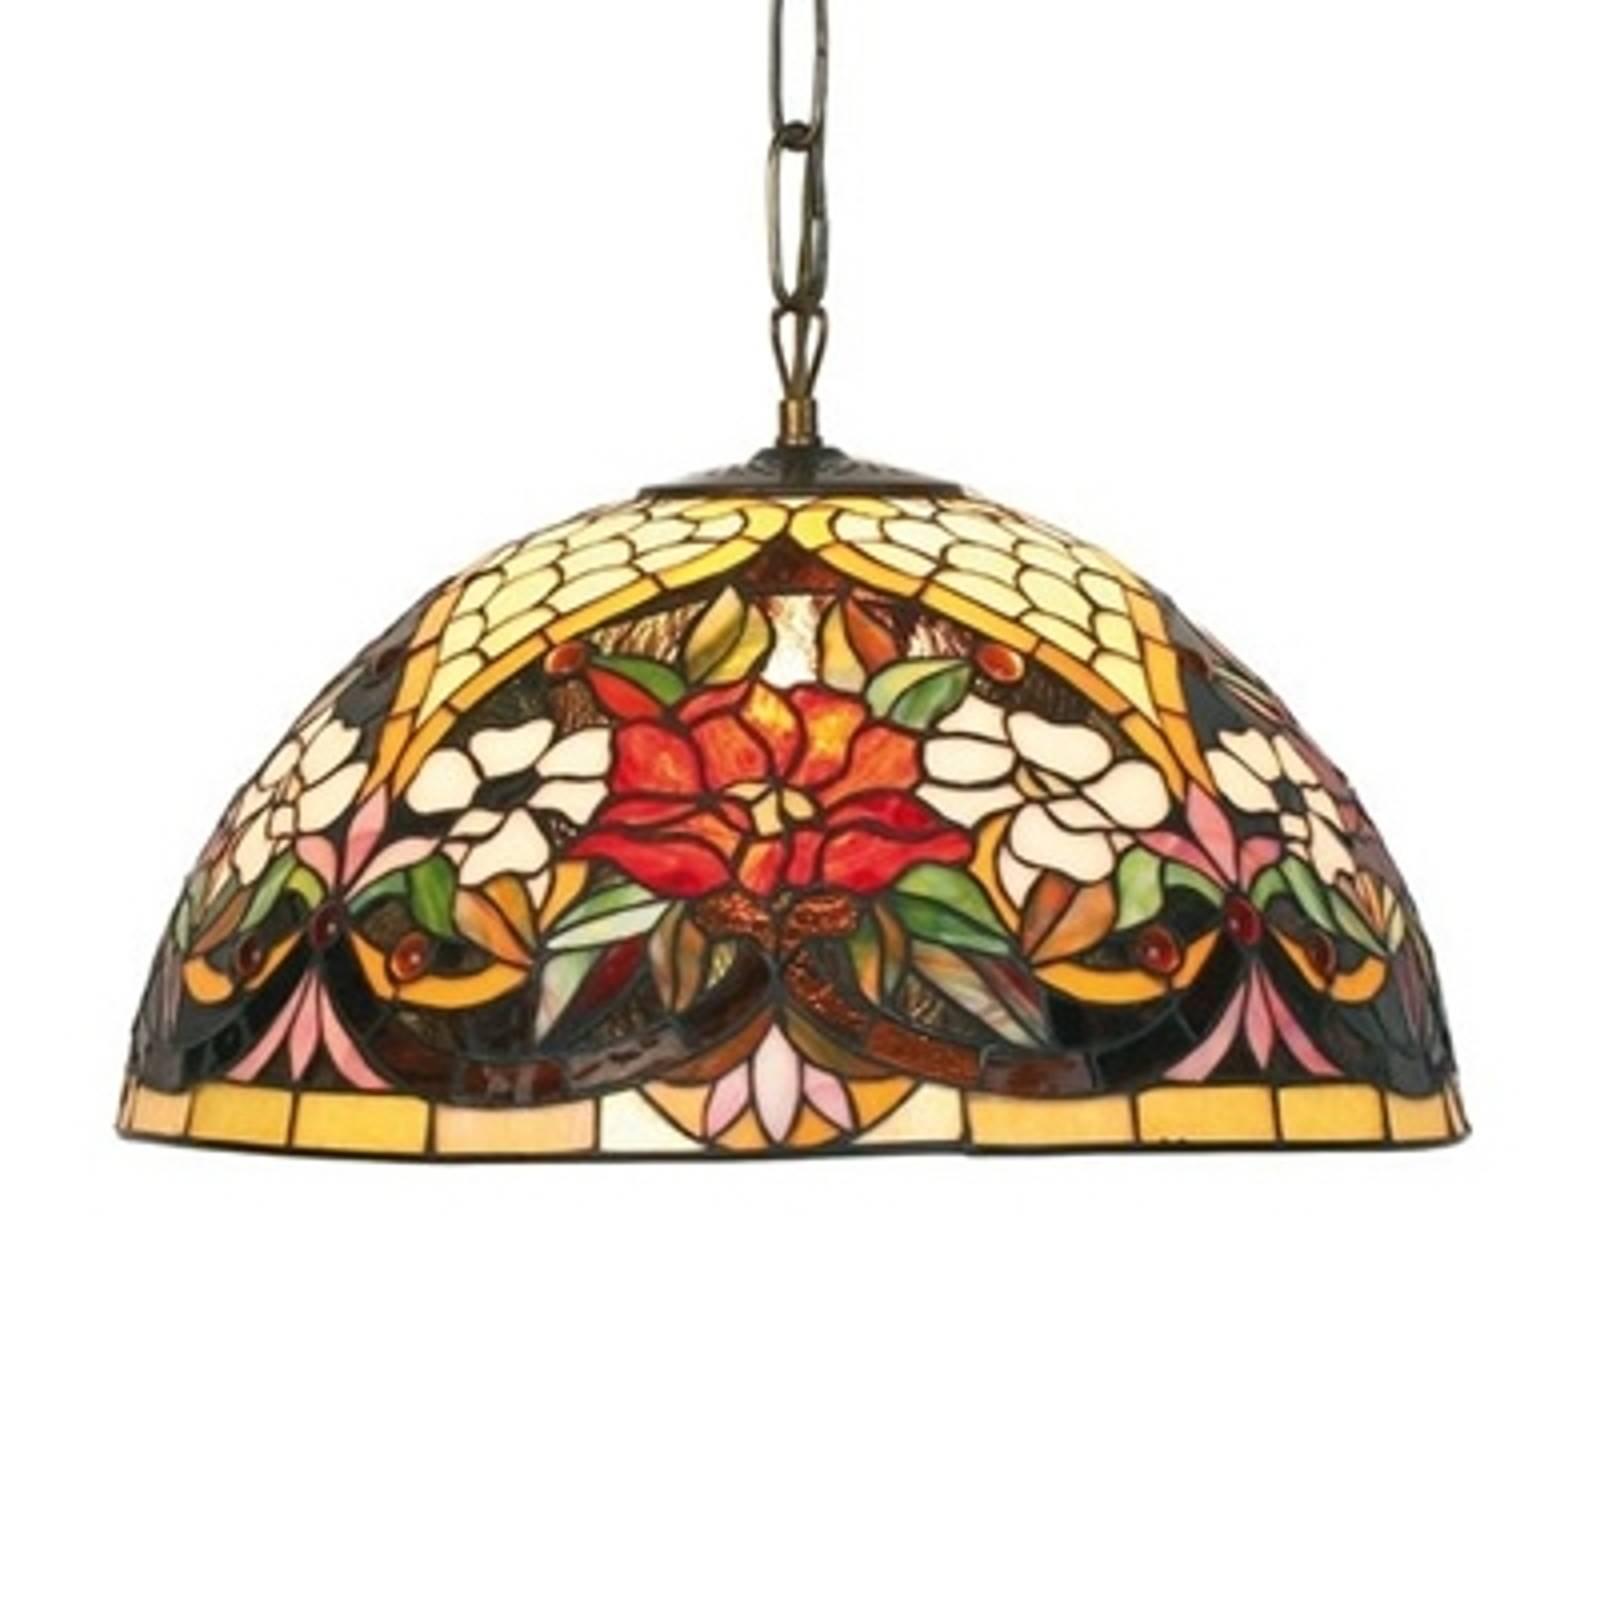 Bloemige hanglamp ANTINA, 2 x E27